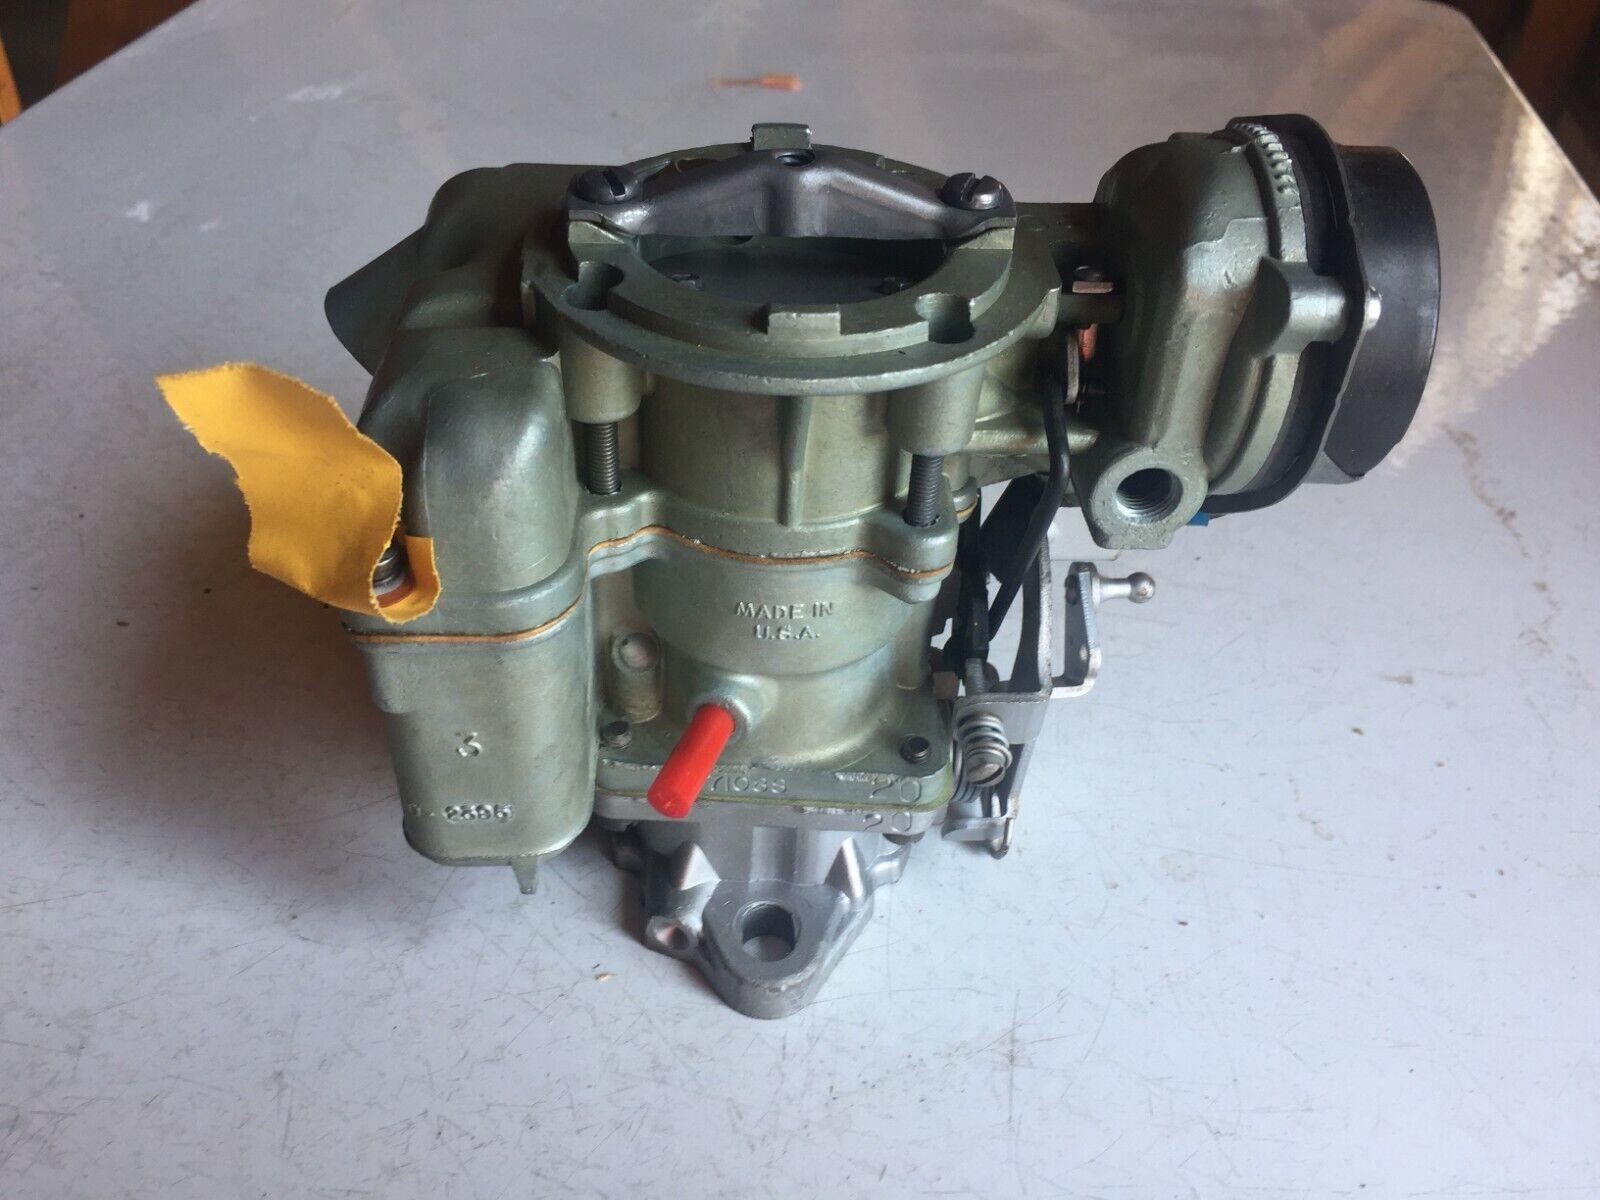 Vintage Ford Carburetor Rebuilt Fits Ford E150,E250 F150, F250  L-6 300cid 1bb